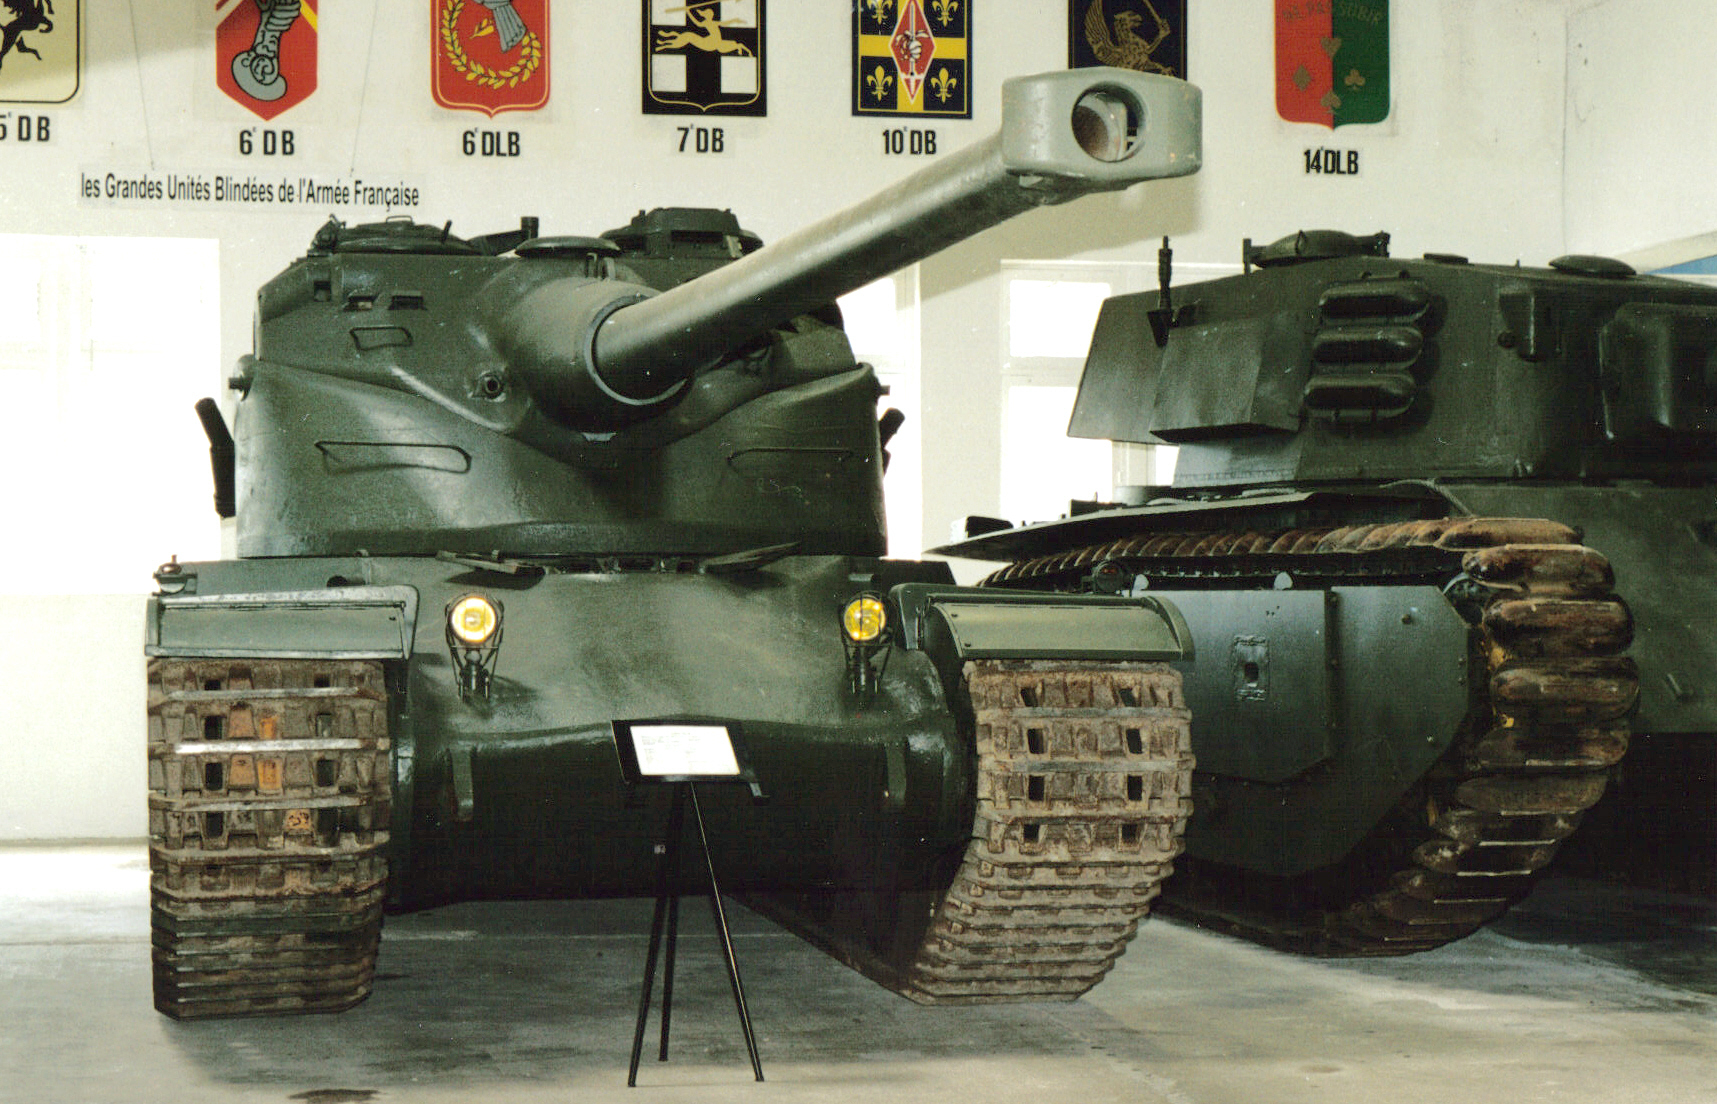 Welt der Panzer b1 Matchmaking